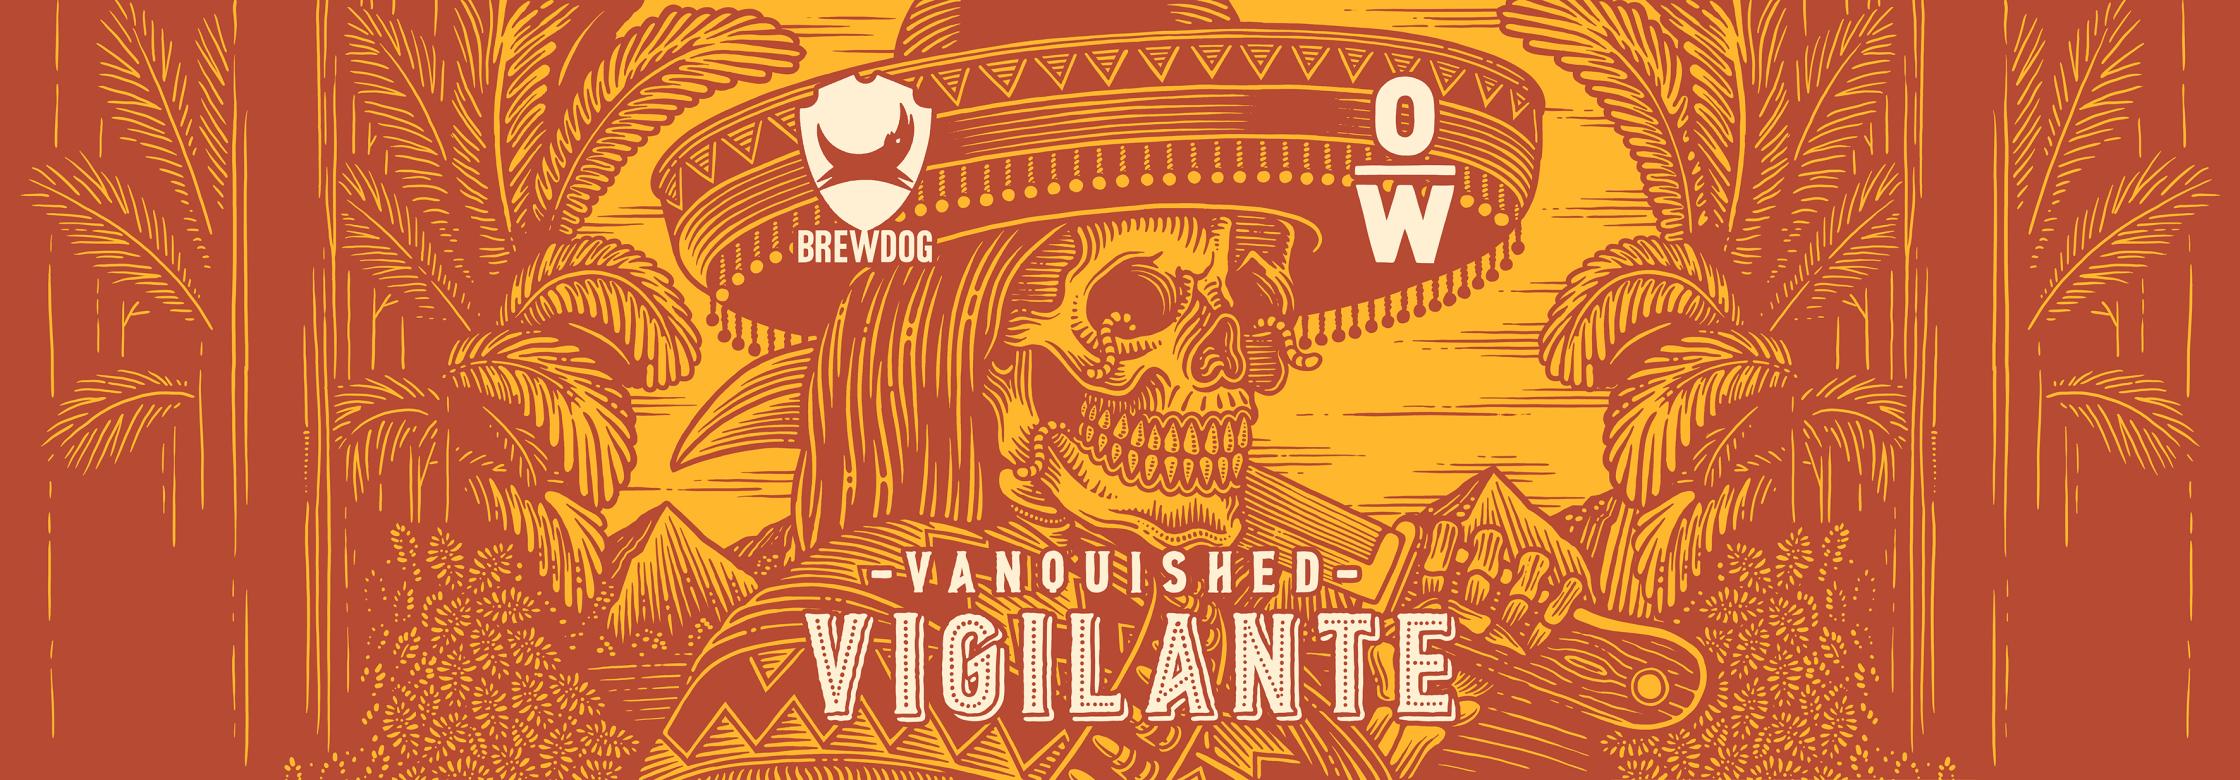 01_brewdog_ow_label_mexico.jpg